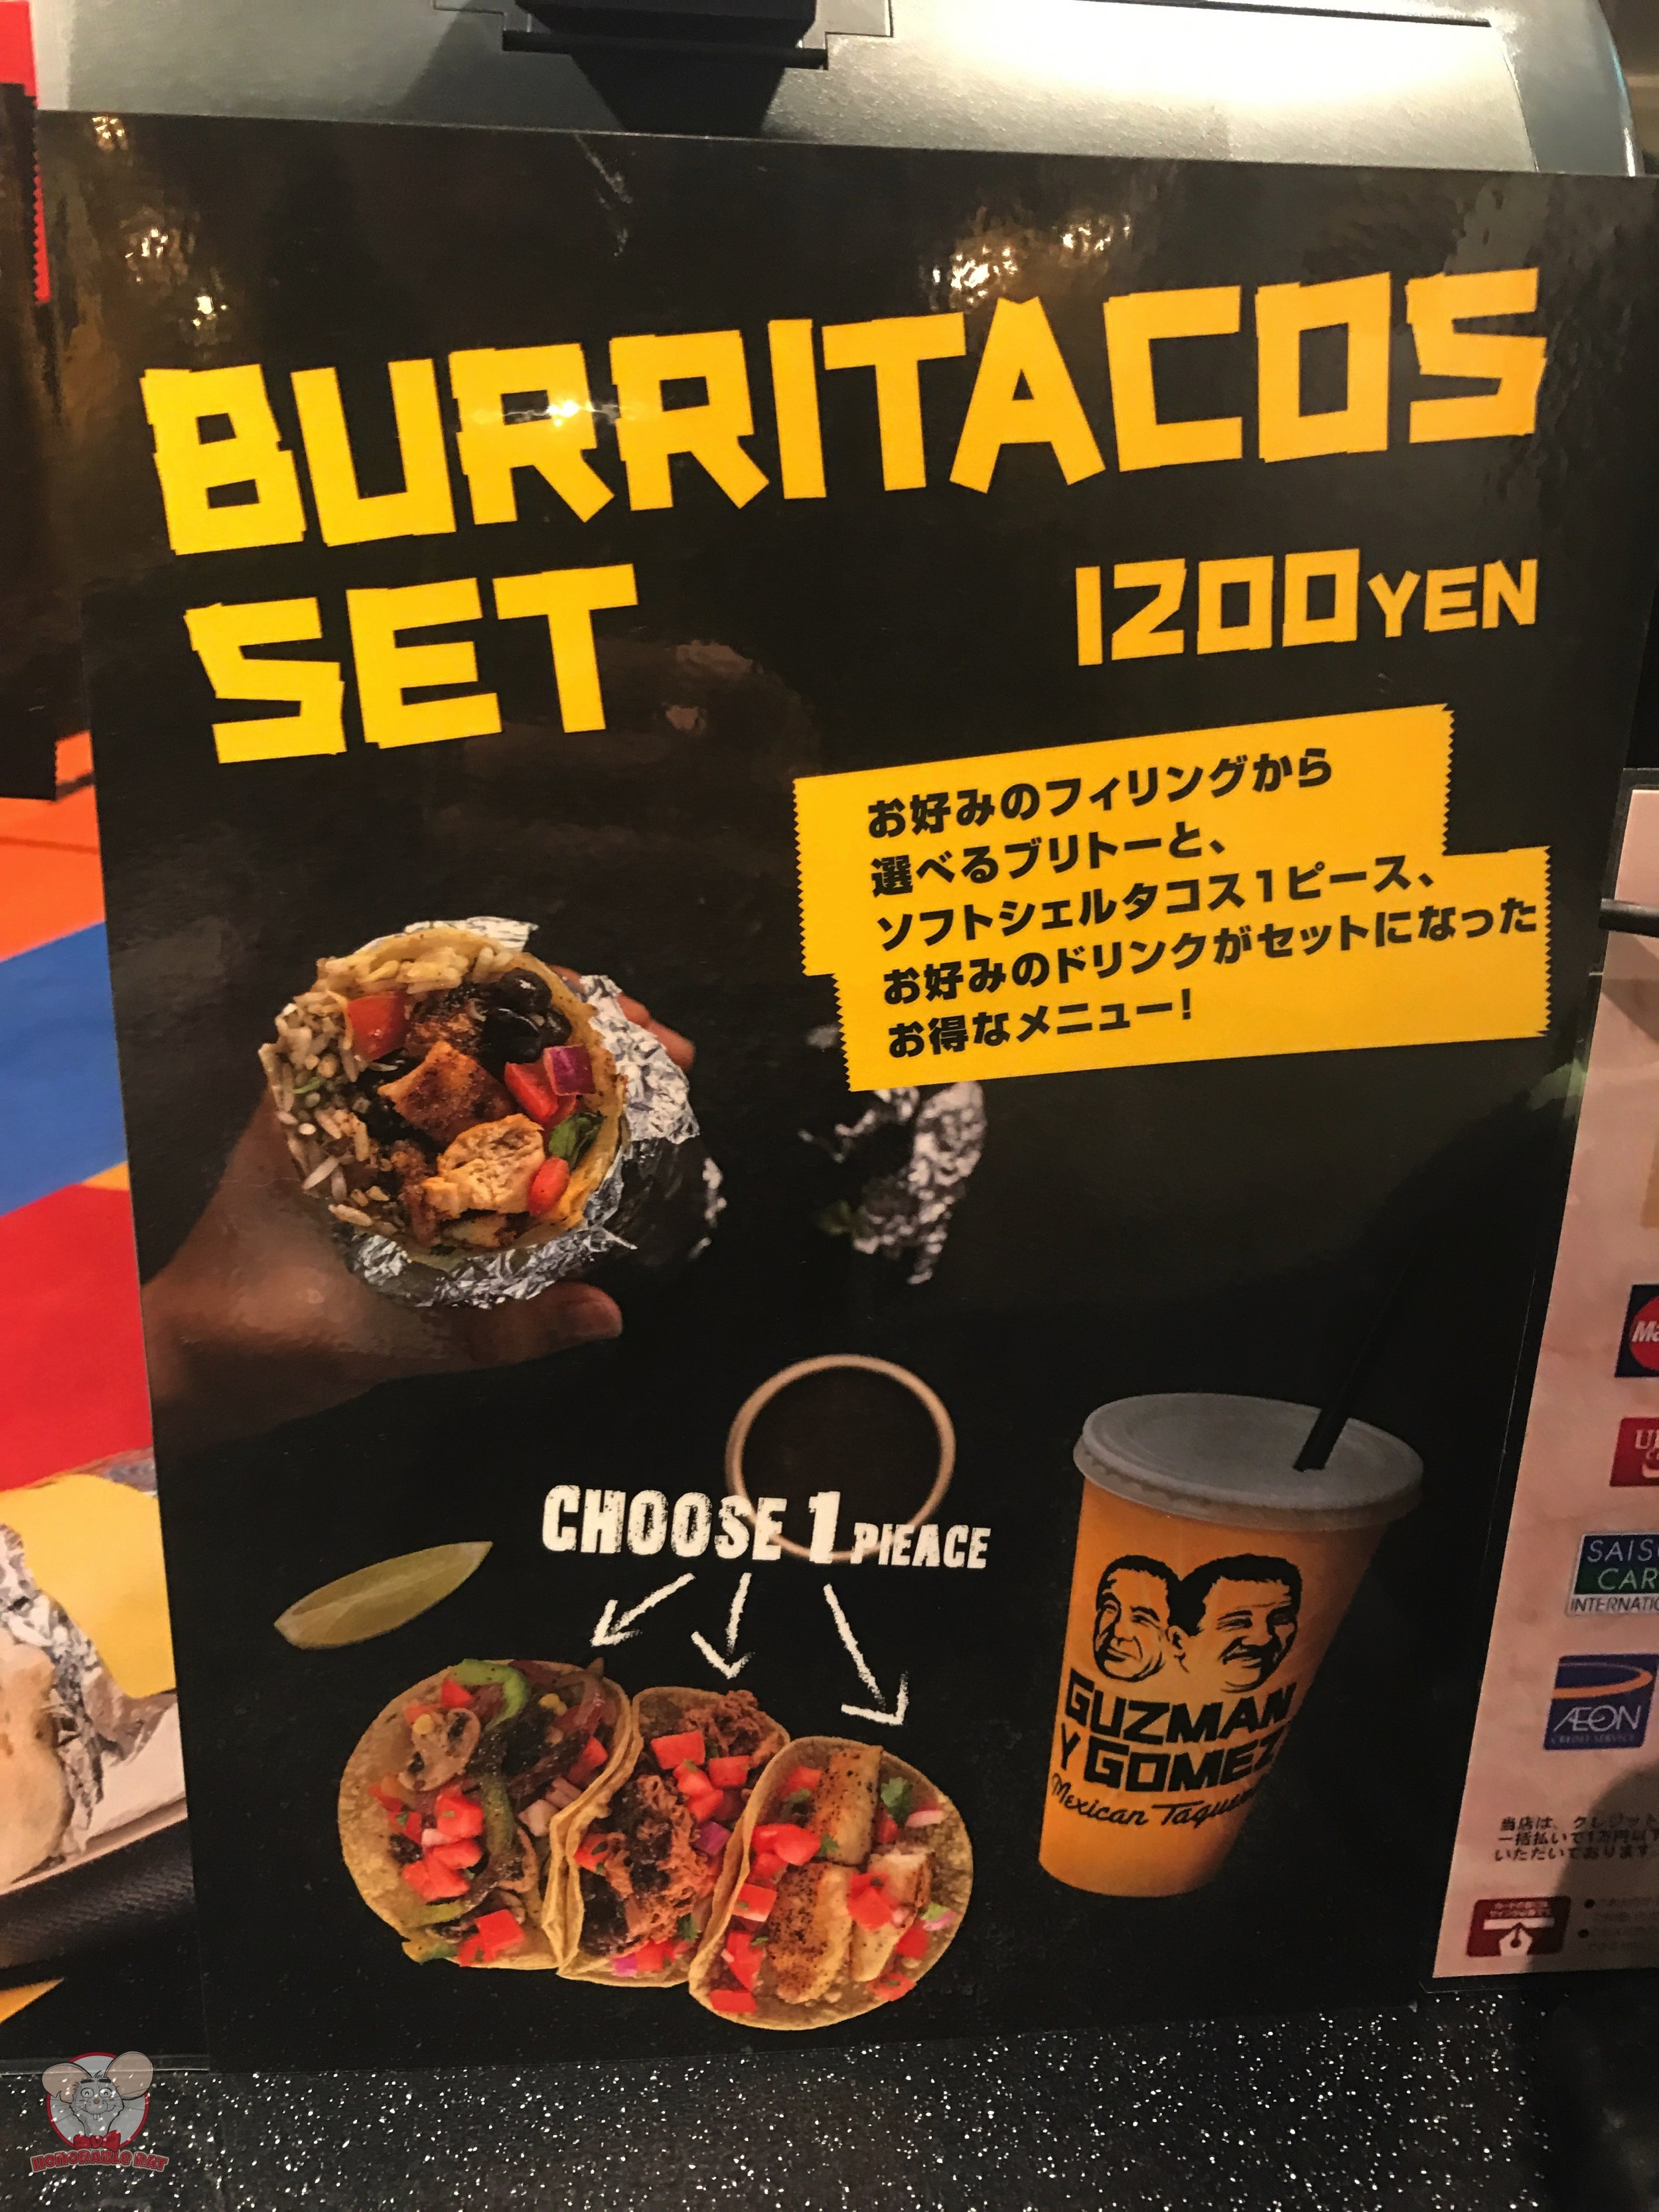 Burritacos Set (1,200 yen)